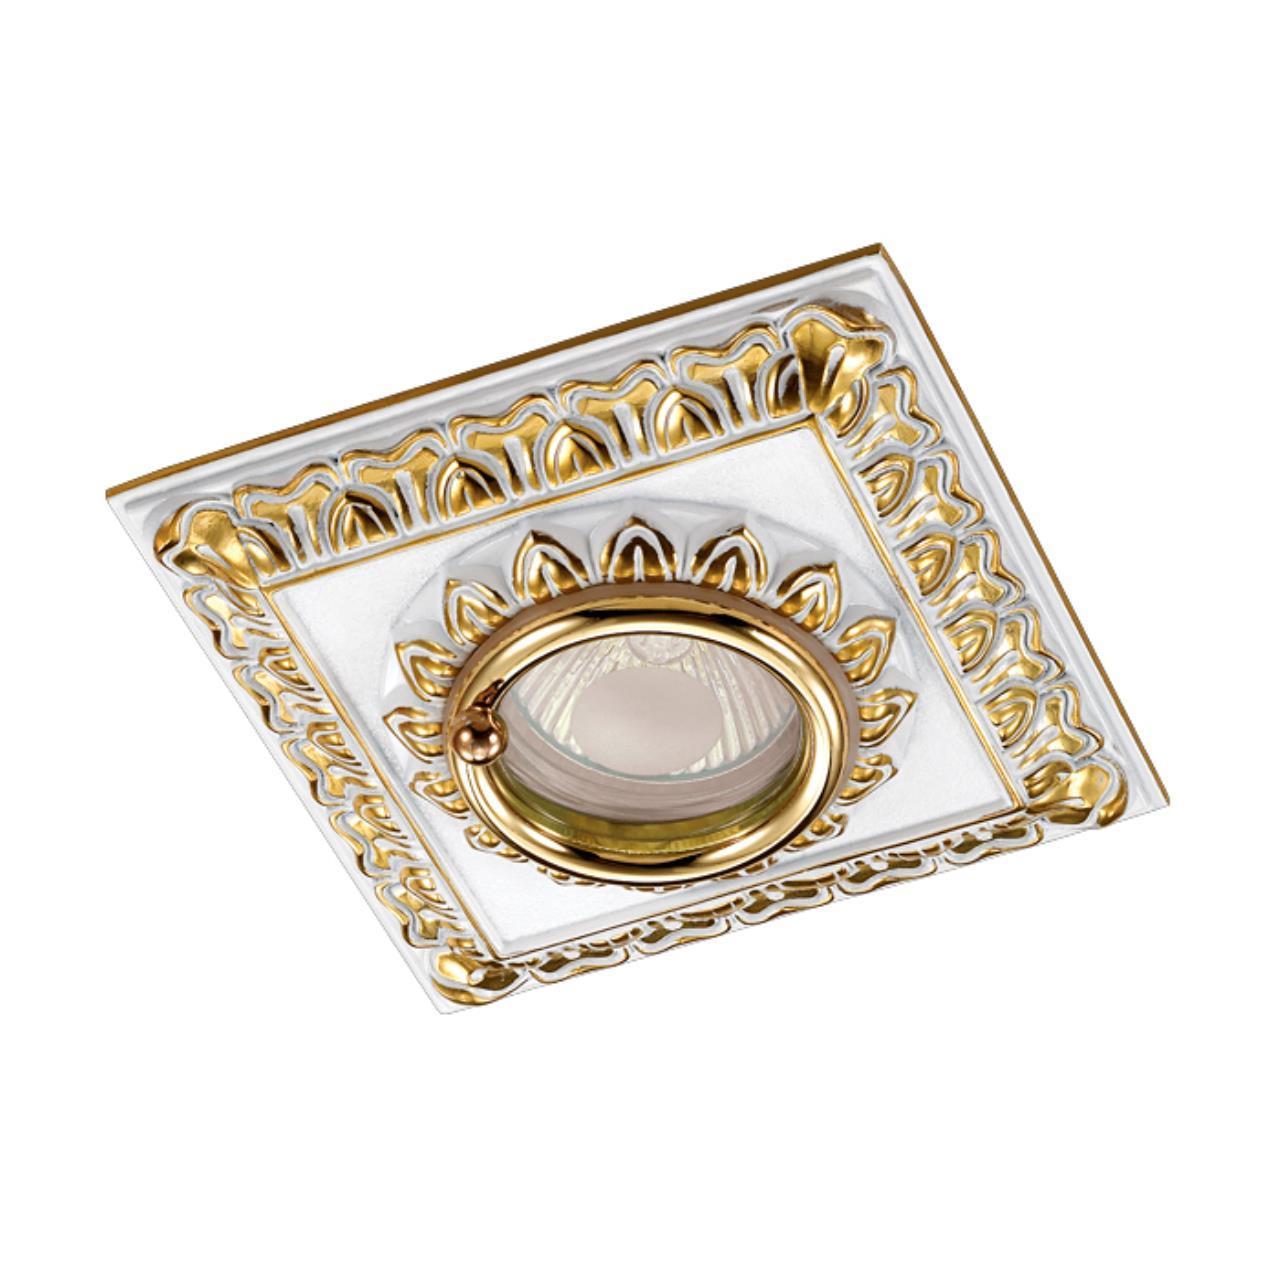 370047 SPOT NT15 139 белый/золото Встраиваемый светильник IP44 GX5.3 50W 12V DAISY